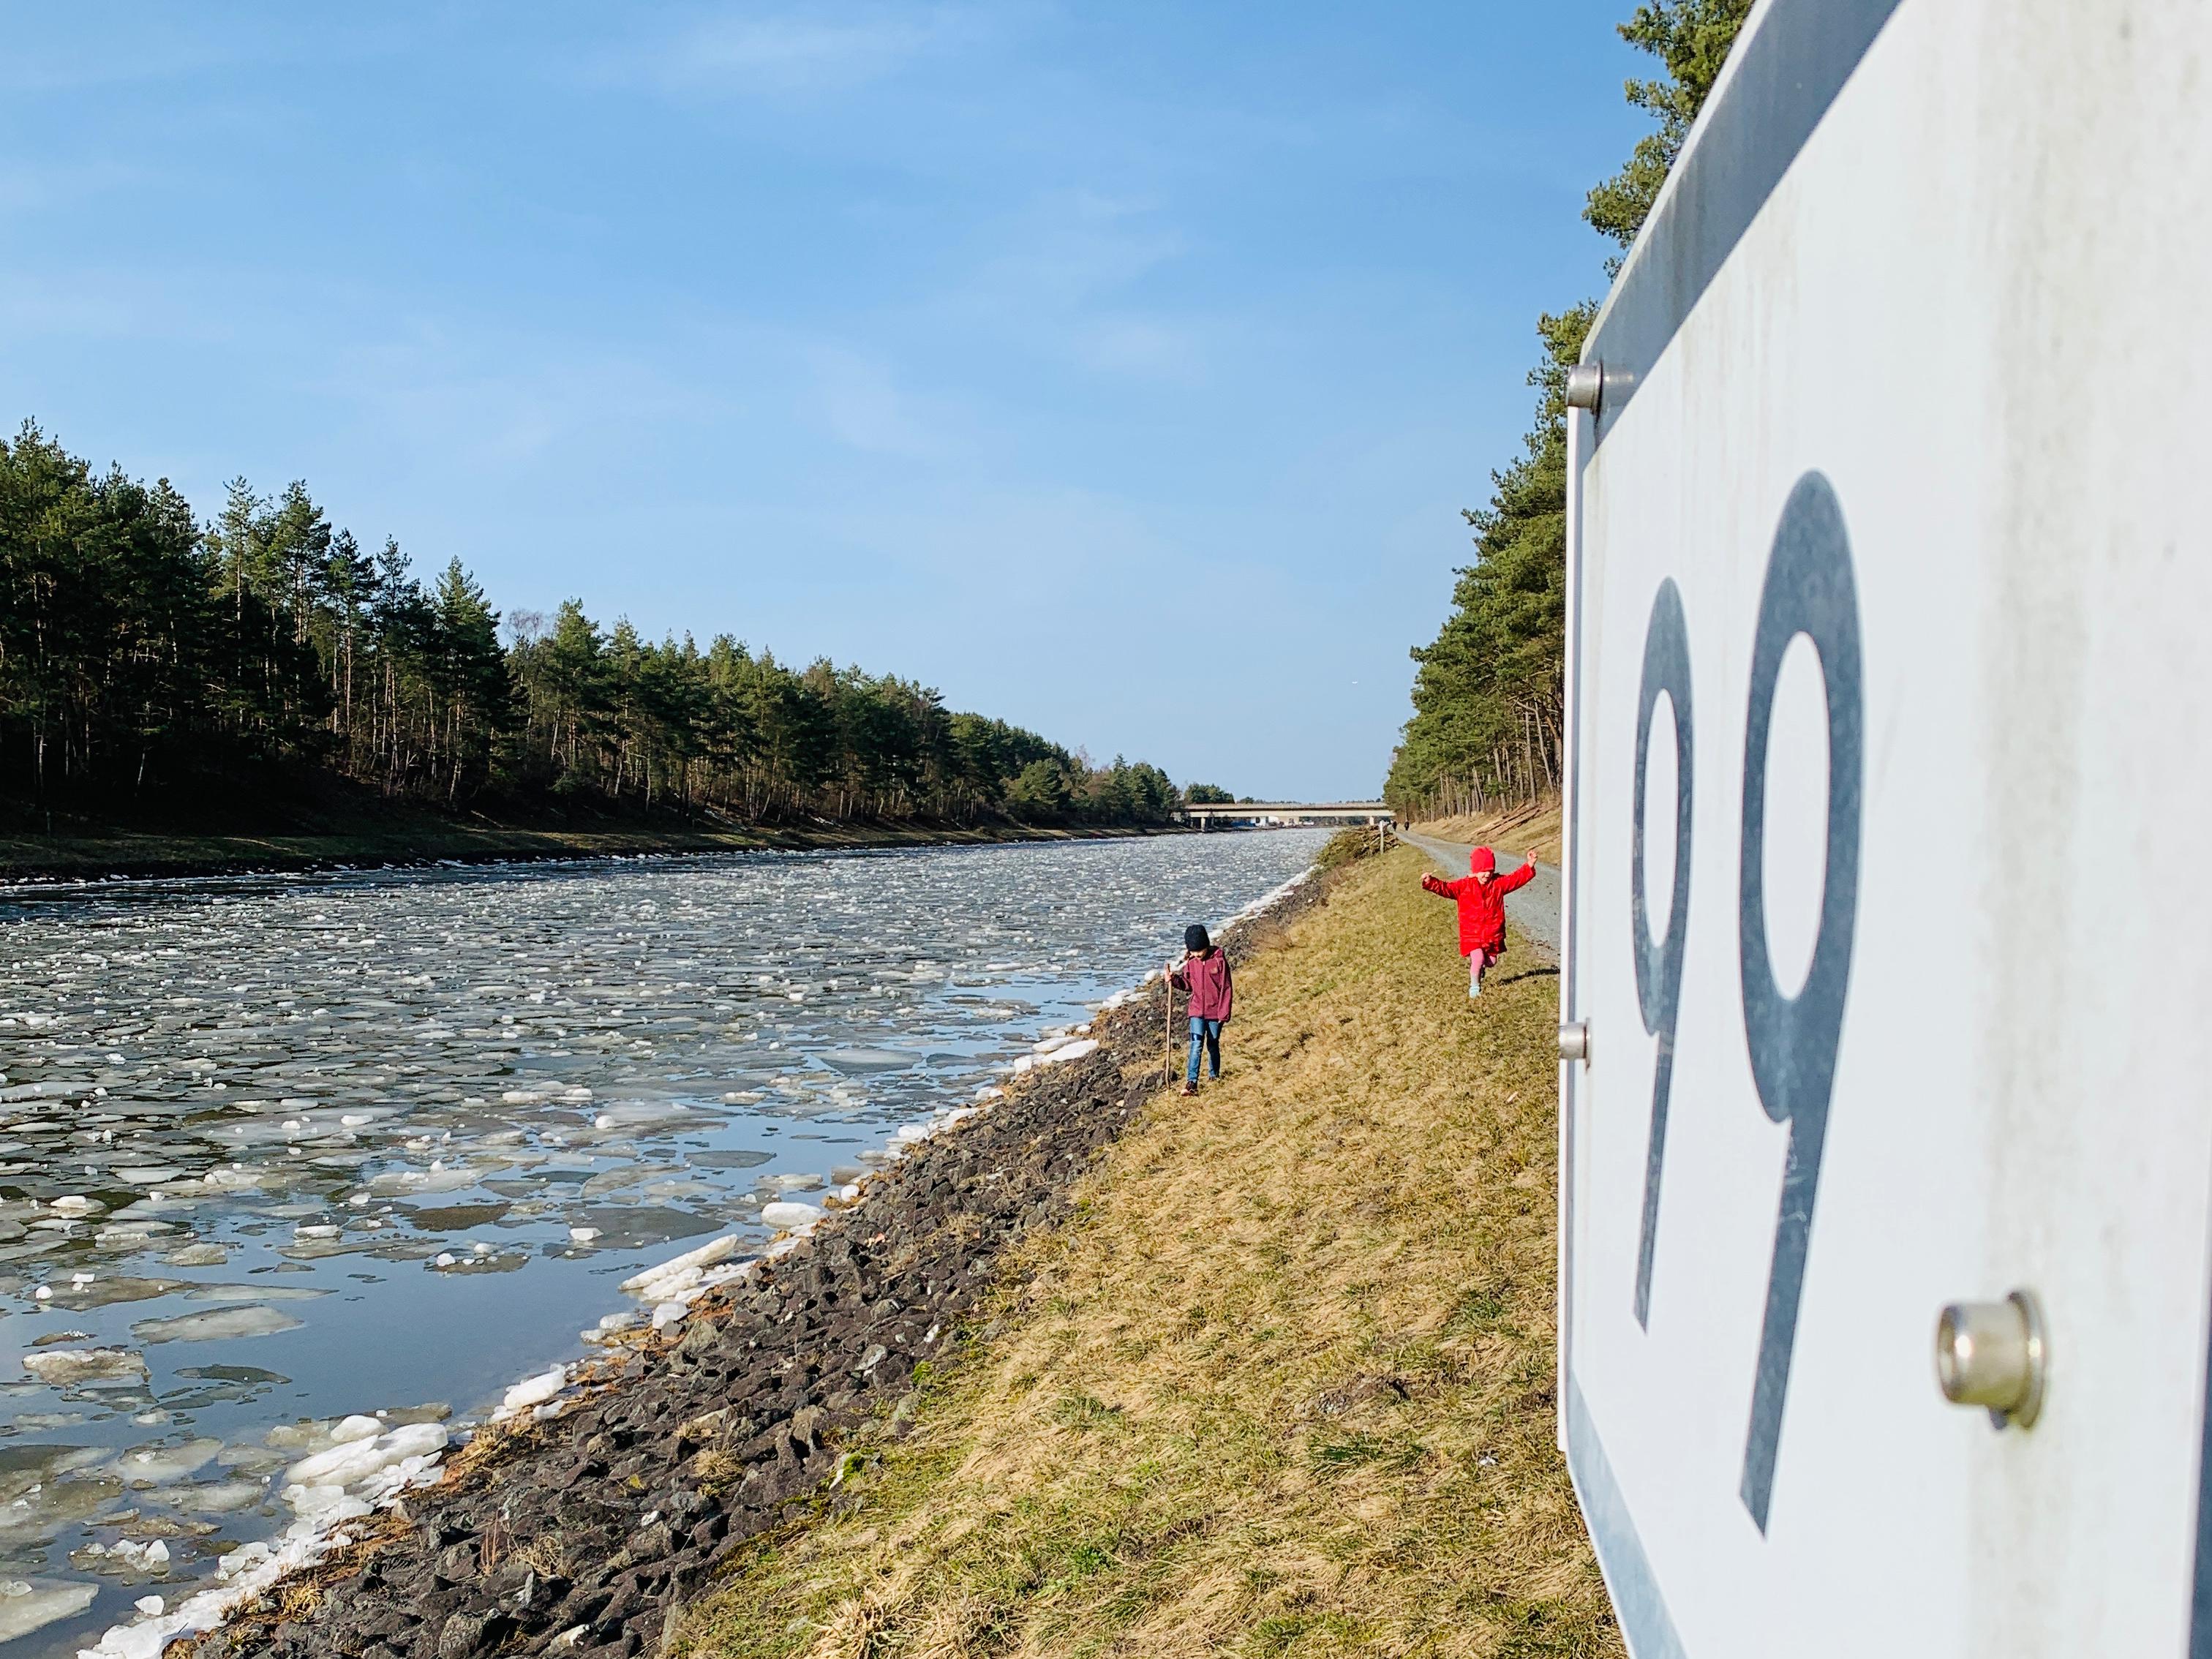 Elbe-Seitenkanal, B216, Spazieren in Lüneburg, Familienausflug, Pixiabenteuer, Lüneburger Heide,